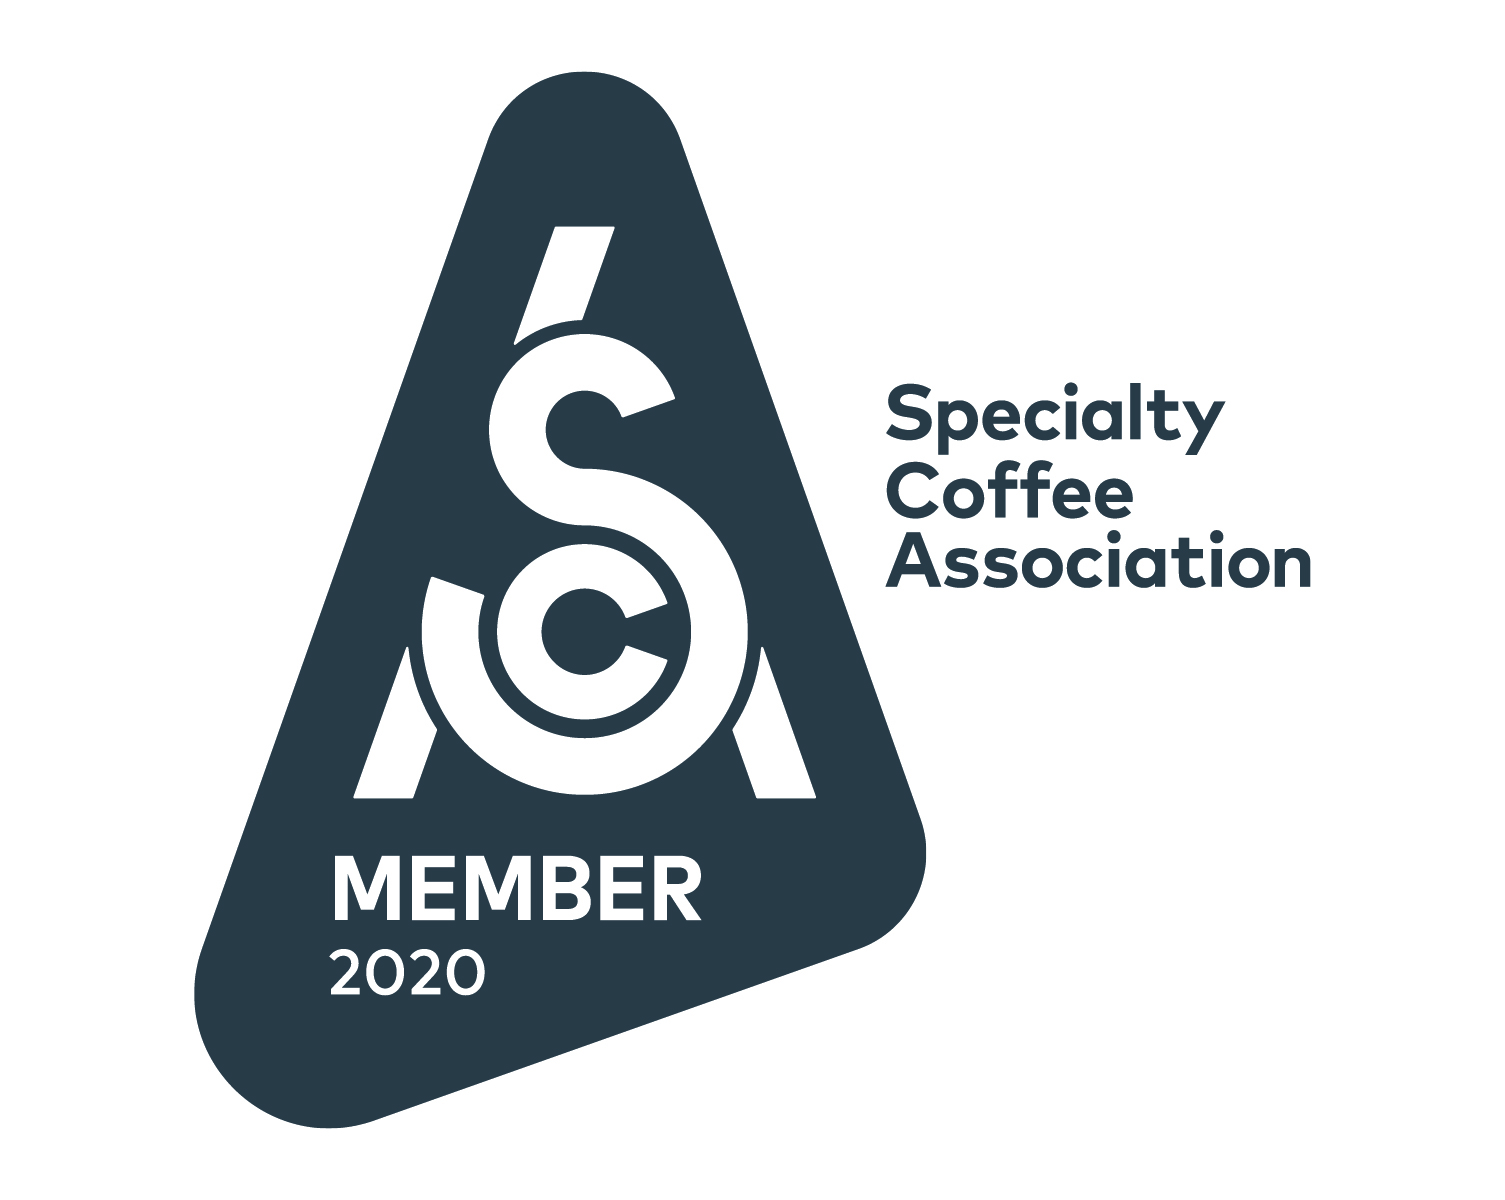 SCA Member 2020 Stone With Logotype RBG 2x 100